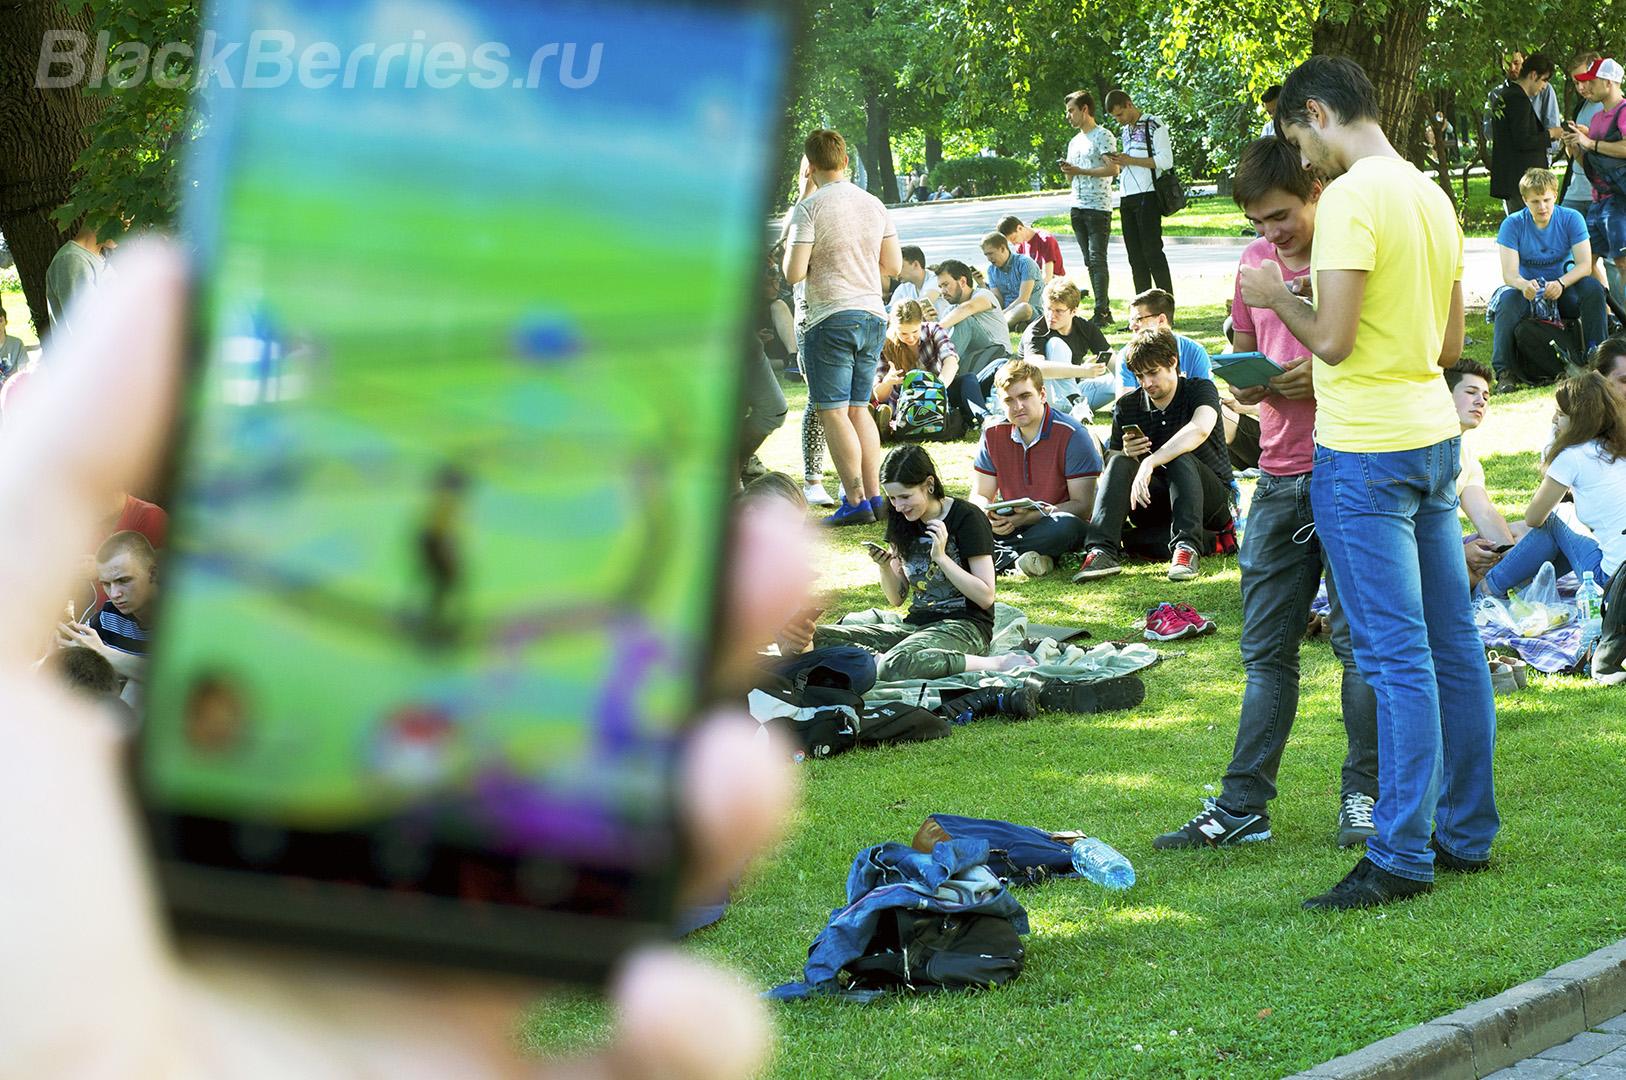 Pokemon-Go-BlackBerry-19